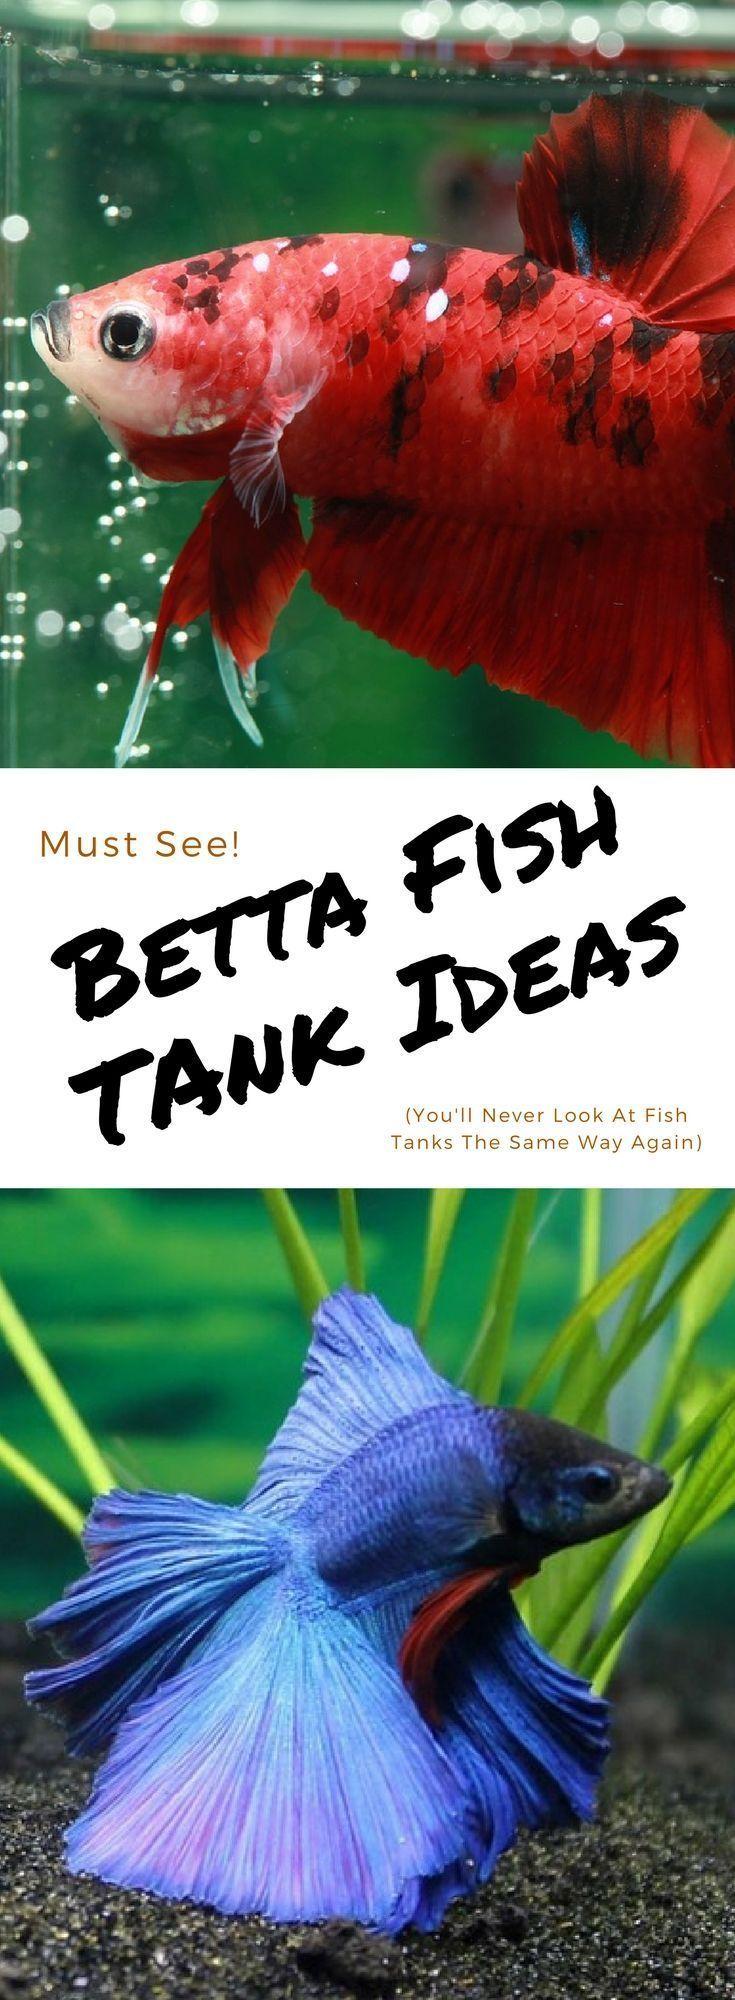 Betta Fish Tank Setup Ideas That Make A Statement! | Betta Board ...